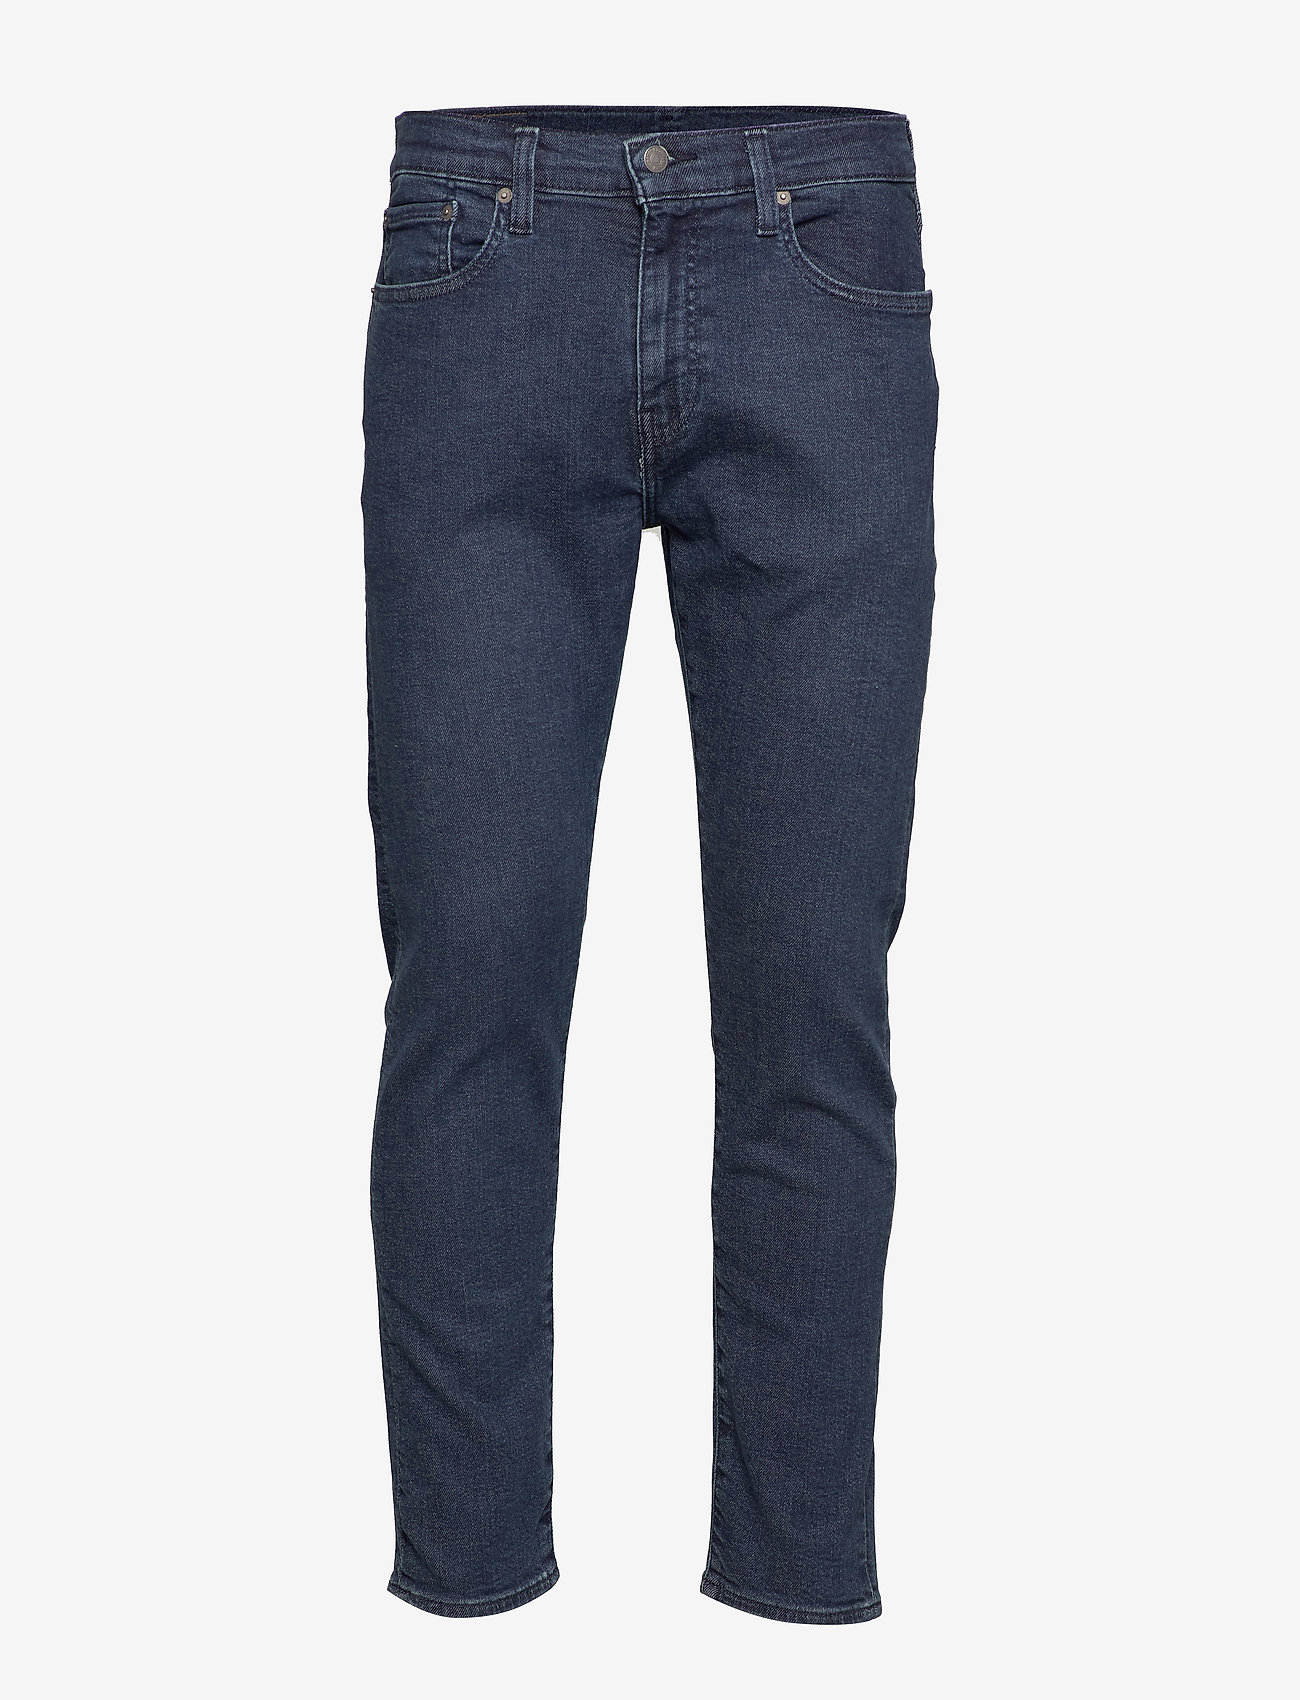 LEVI´S Men - 512 SLIM TAPER SAGE NIGHTSHINE - slim jeans - dark indigo - flat finish - 1